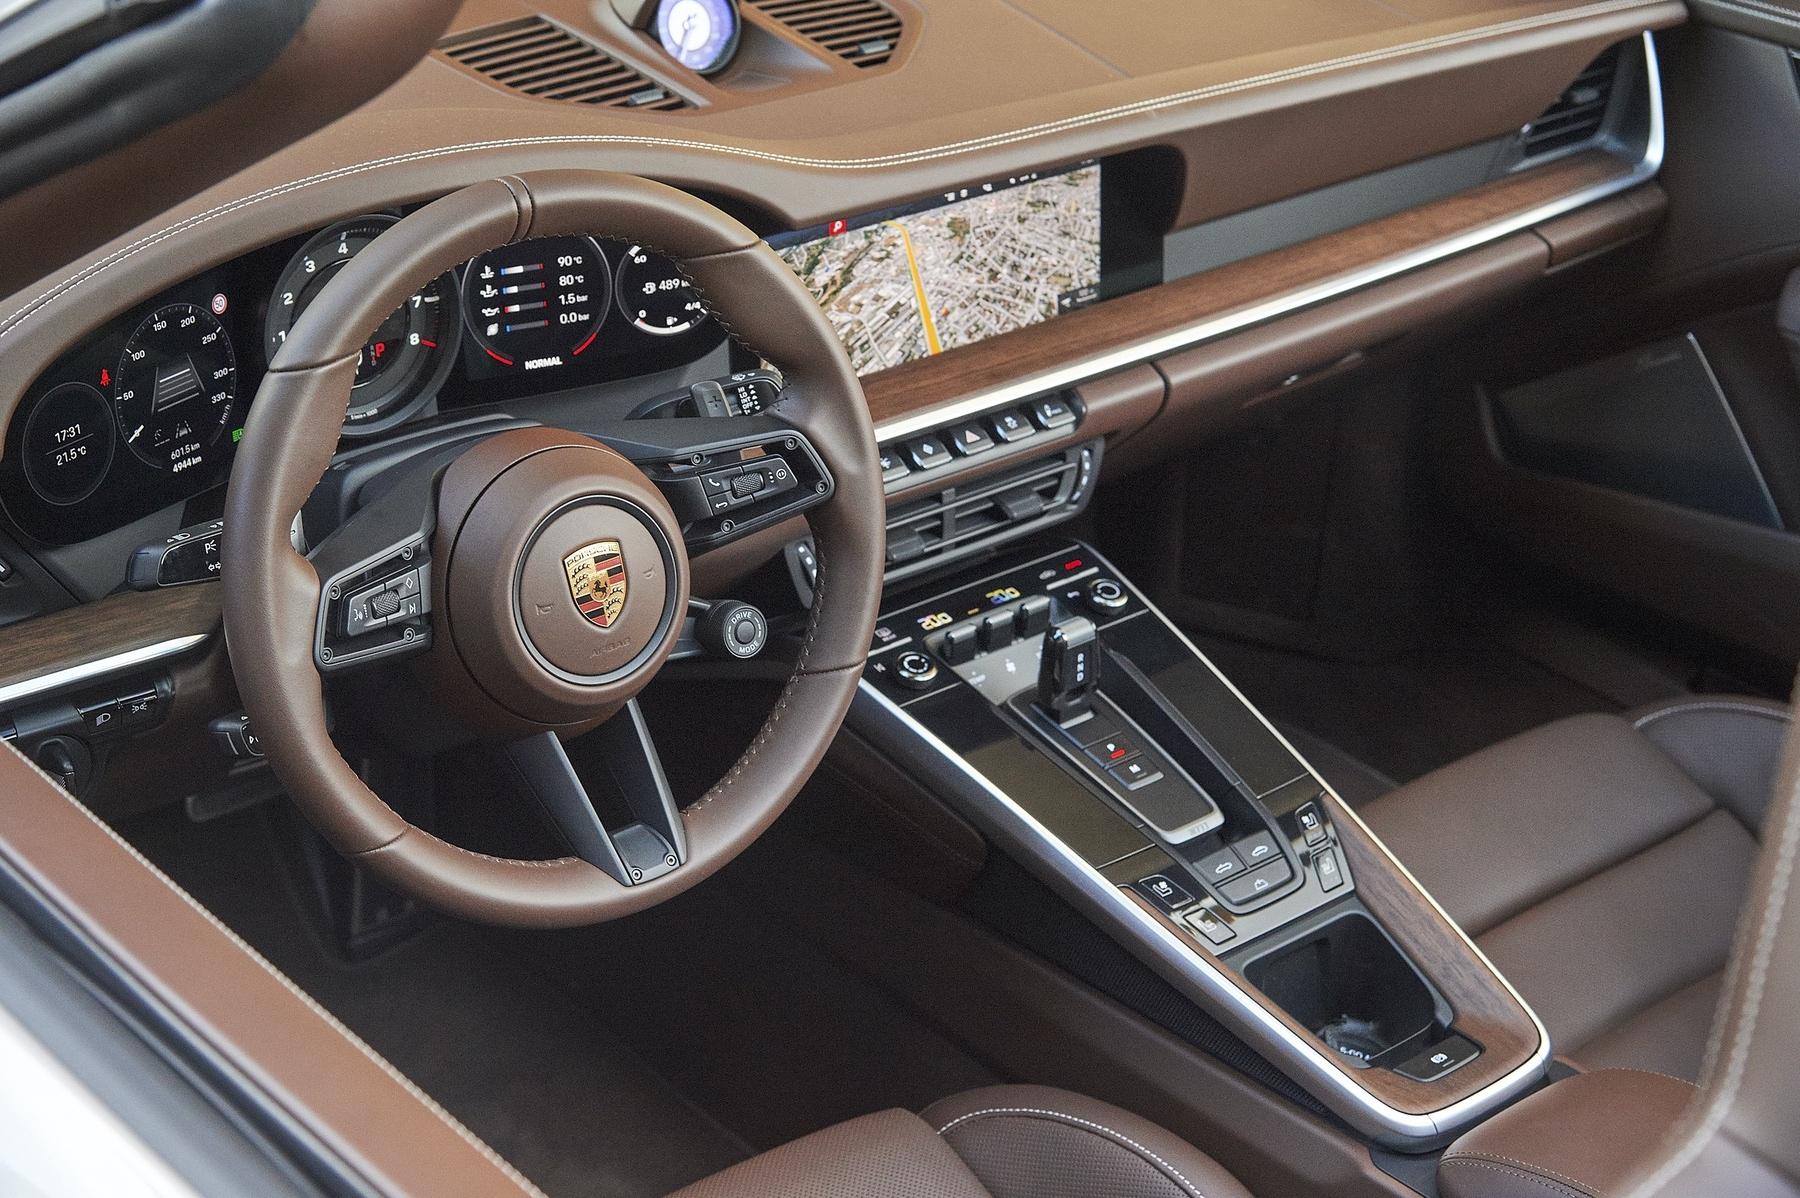 Test_Drive_Porsche_911_Athens_0173